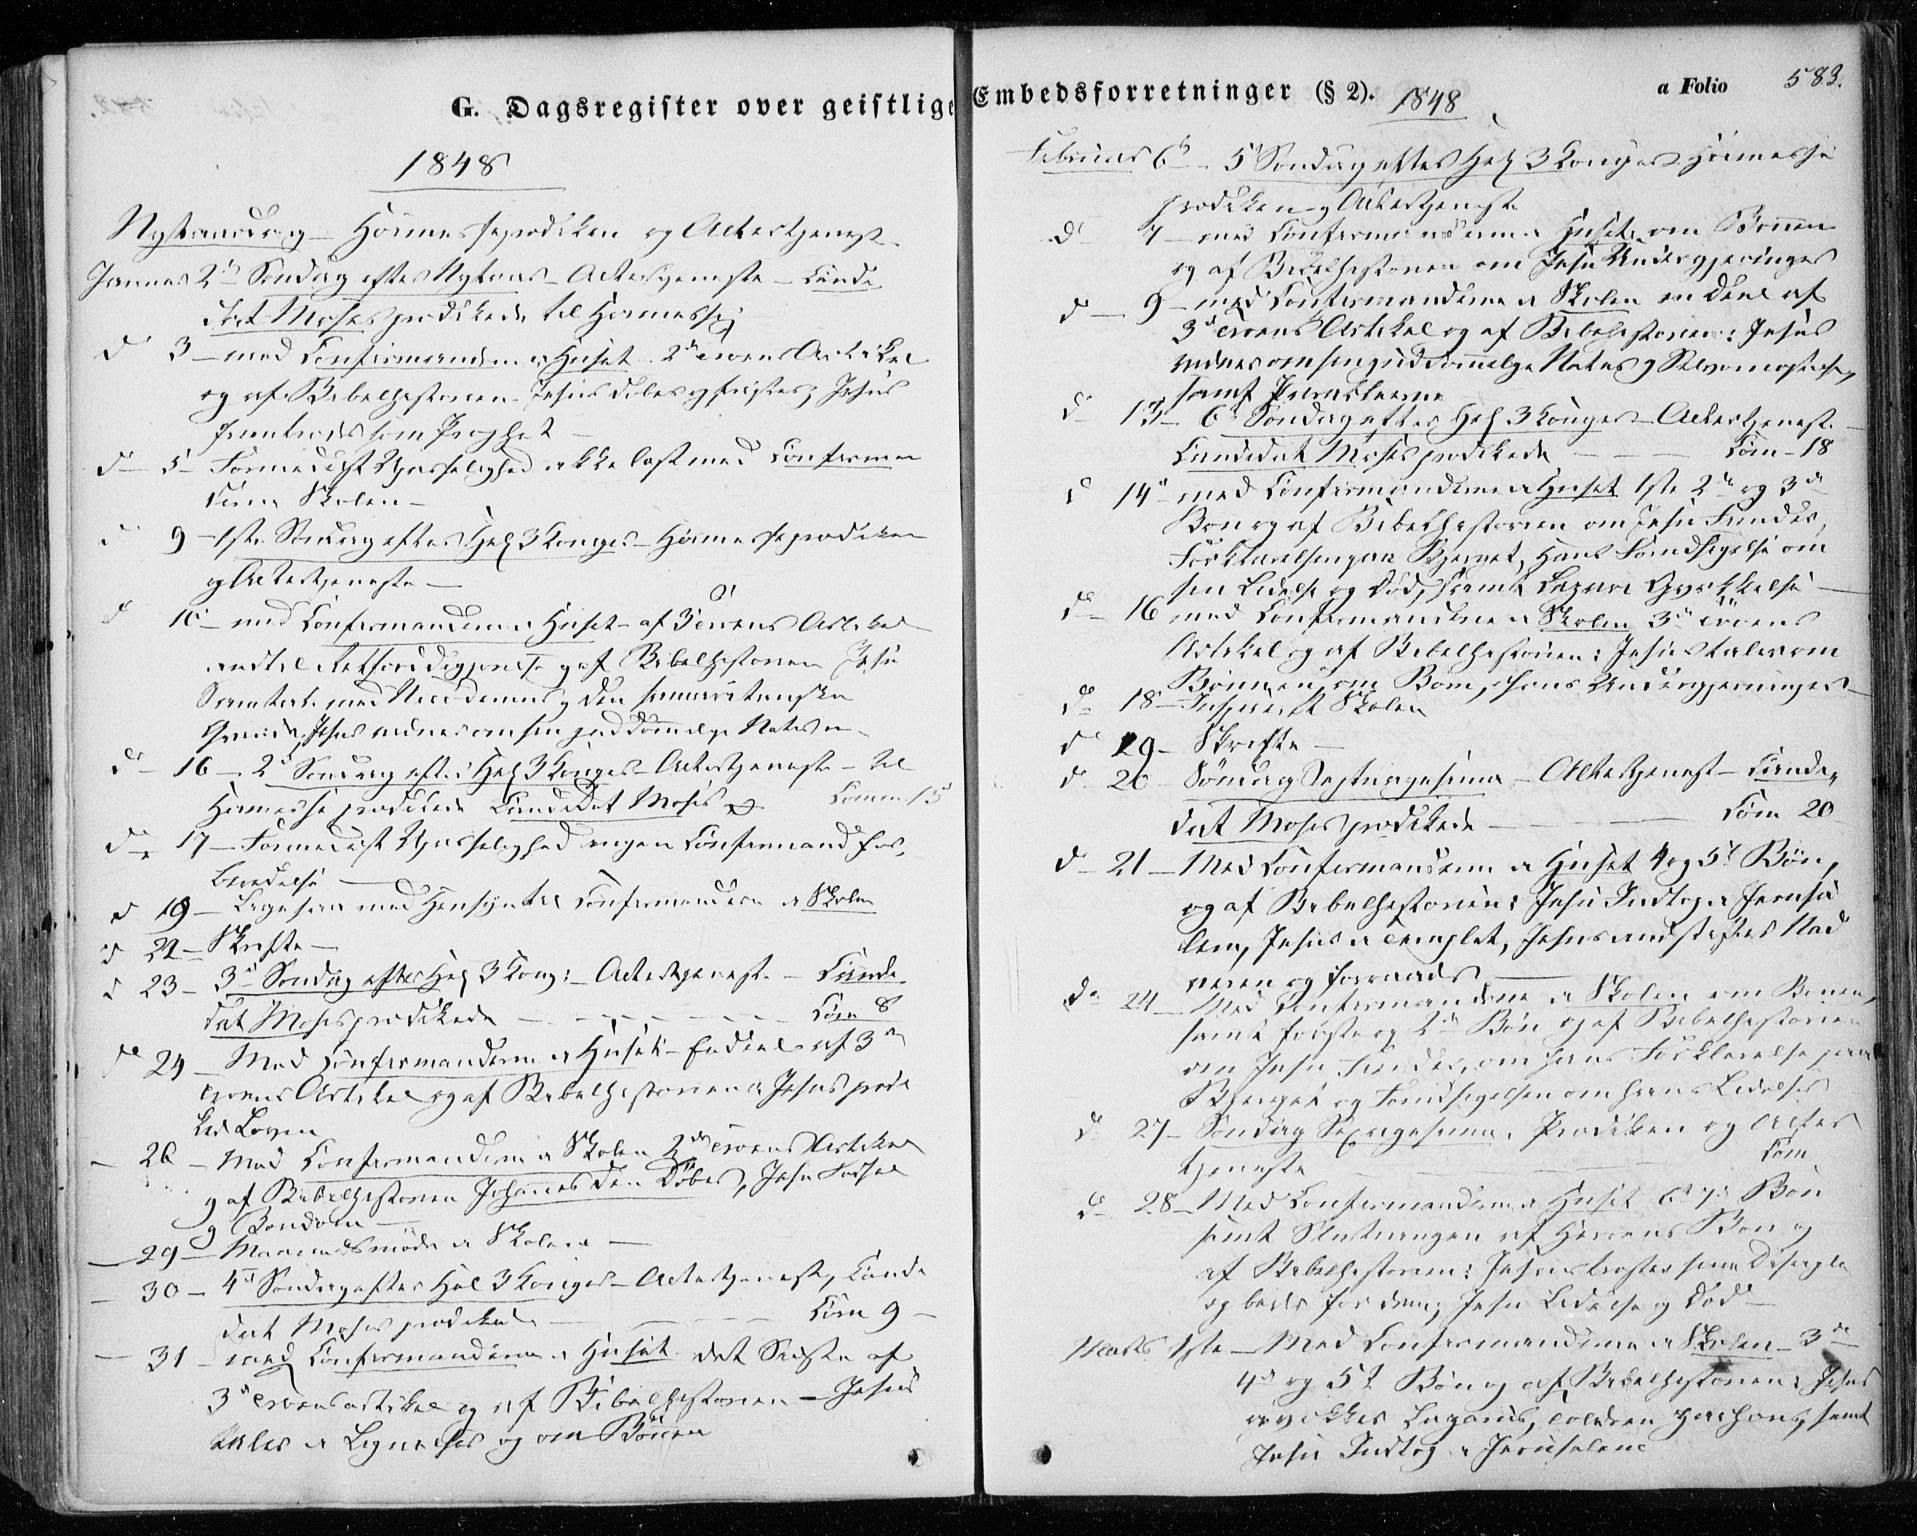 SAT, Ministerialprotokoller, klokkerbøker og fødselsregistre - Sør-Trøndelag, 601/L0051: Parish register (official) no. 601A19, 1848-1857, p. 583